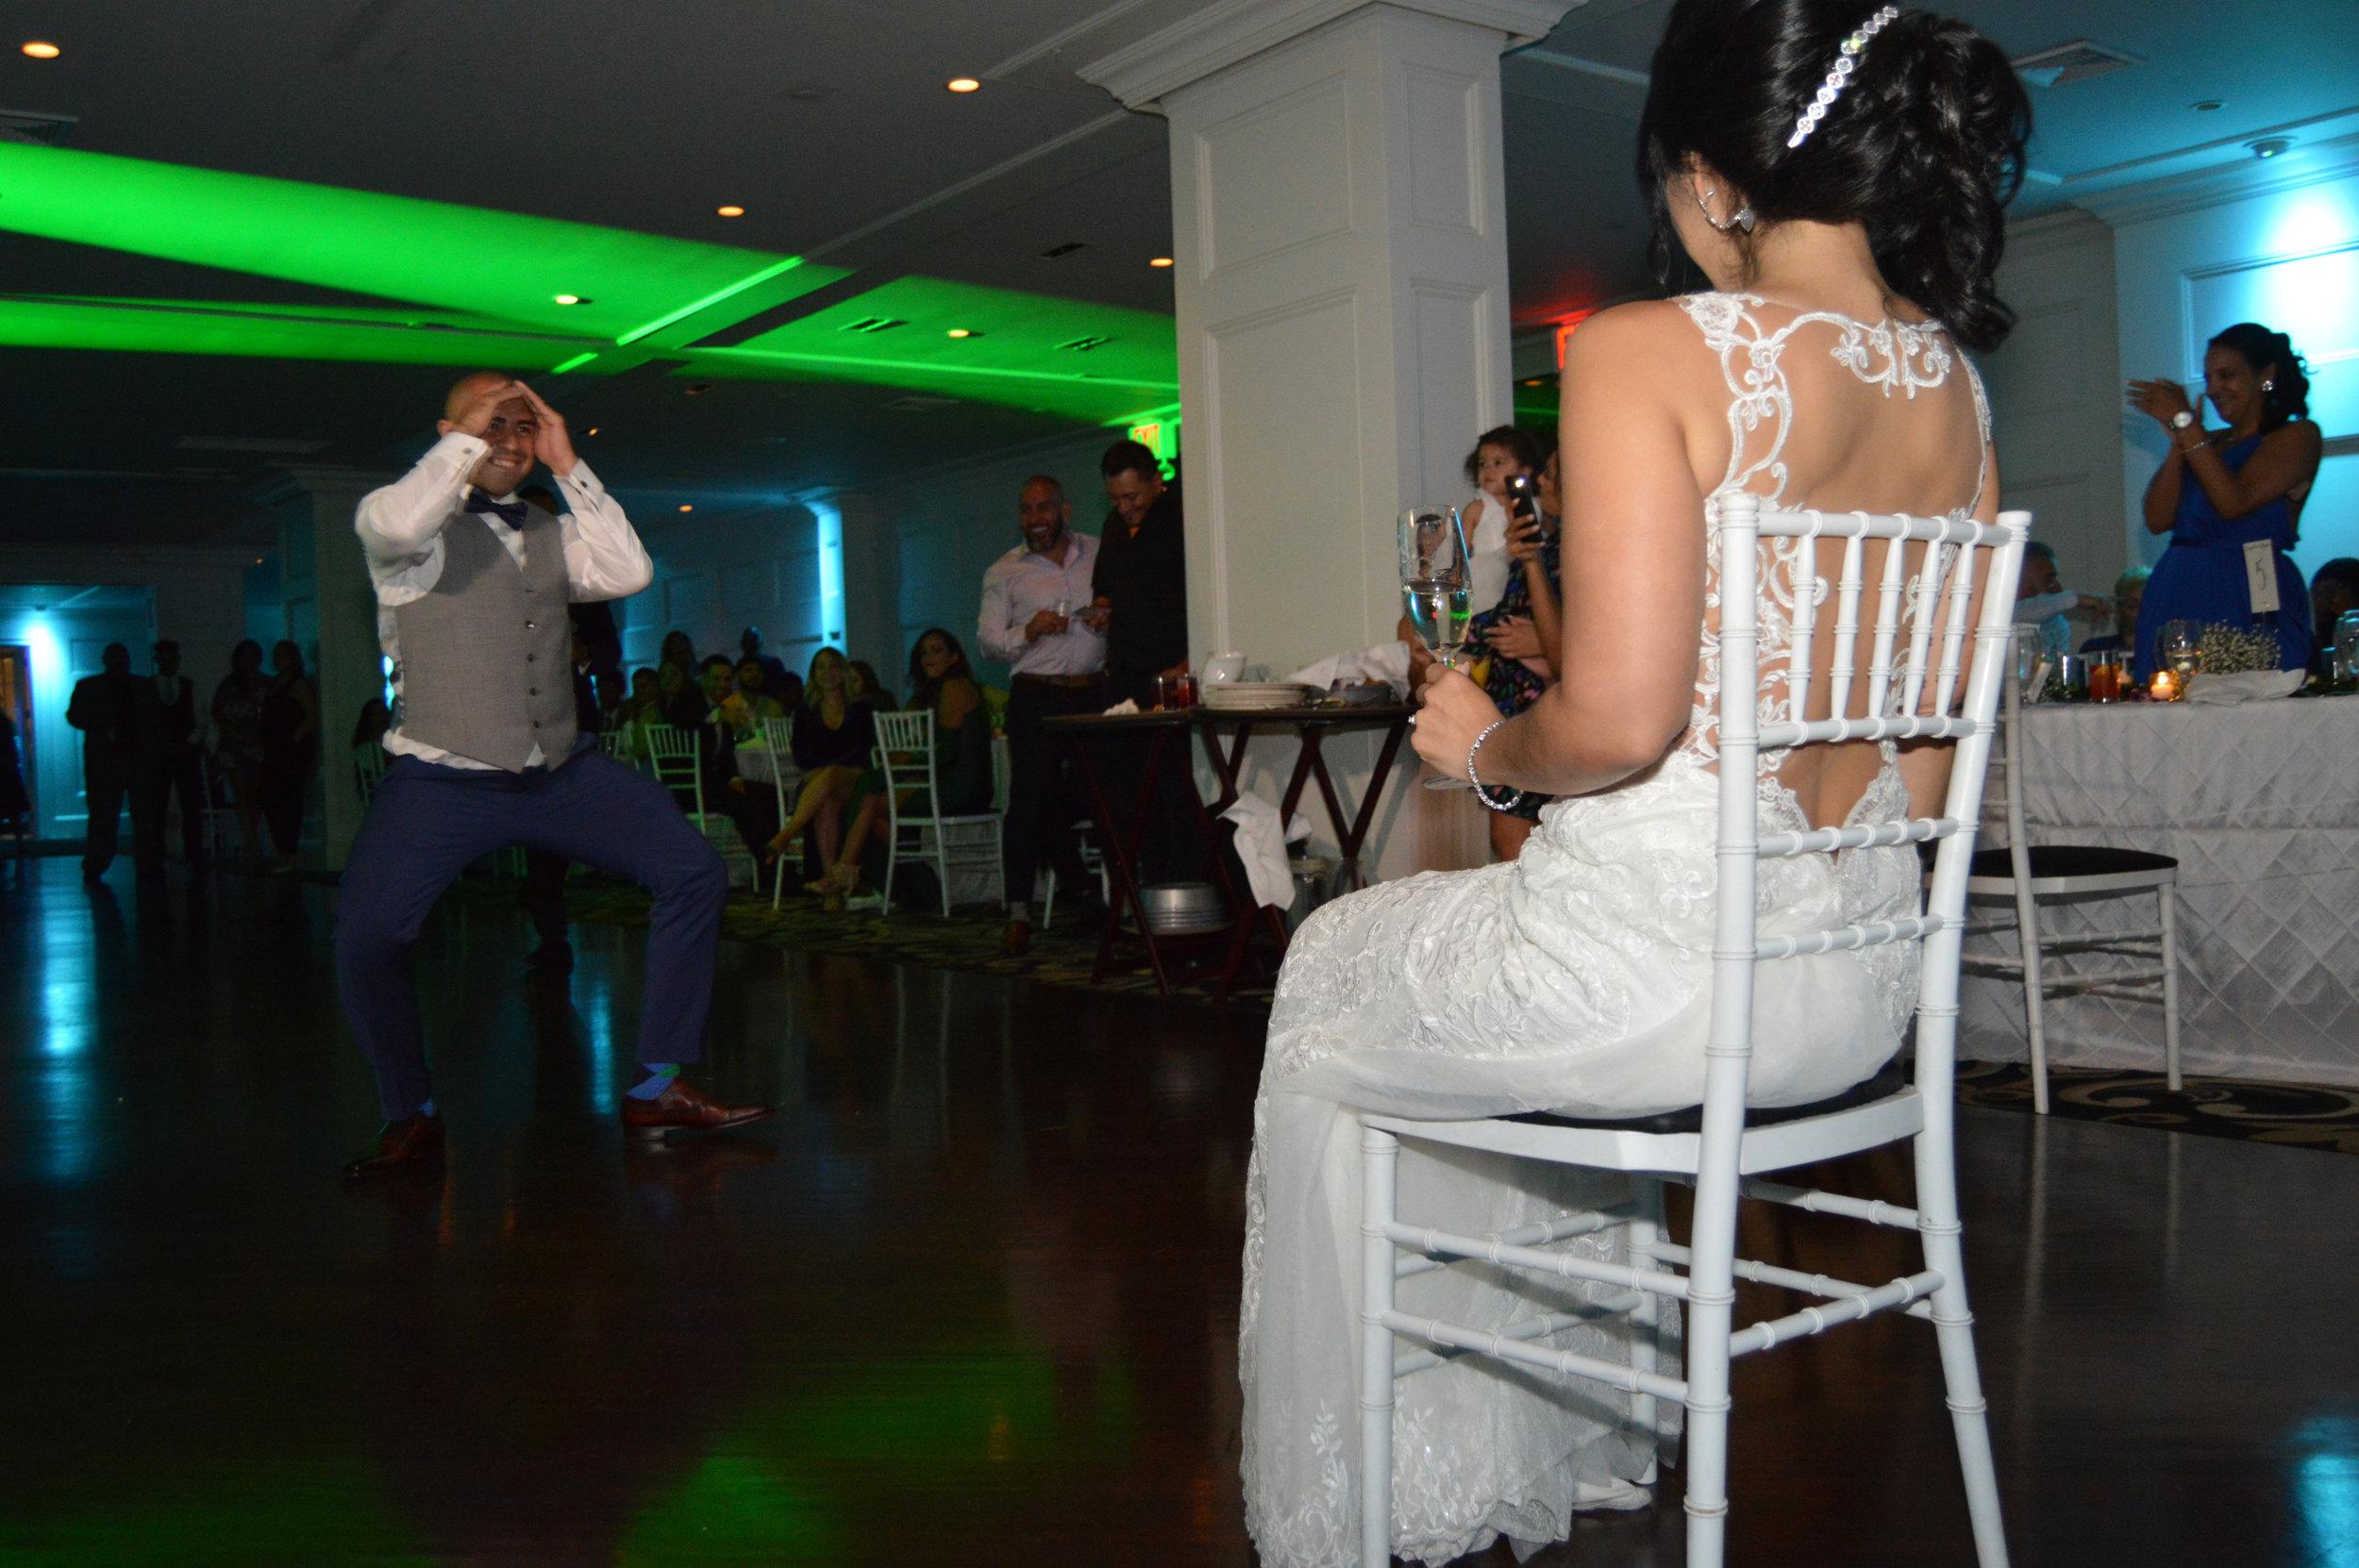 Garter Removal | Groom dance | Groom garter removal dance | wedding reception fun ideas | fun ideas wedding party | www.anajacqueline.com